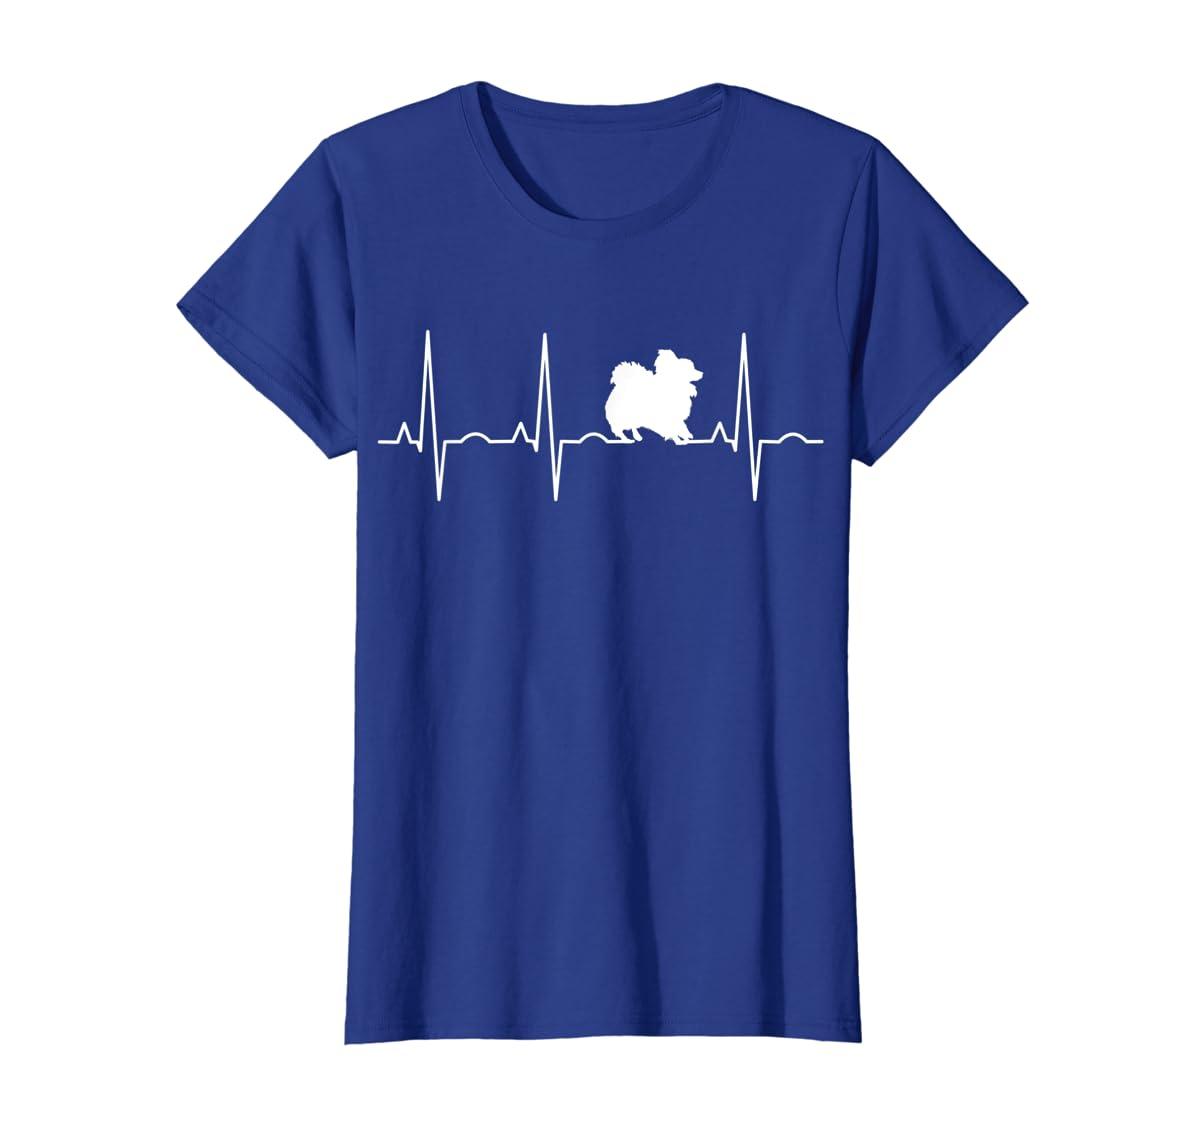 Pomeranian Heartbeat T-Shirt Pom Shirt Gifts Dog Lover-Women's T-Shirt-Royal